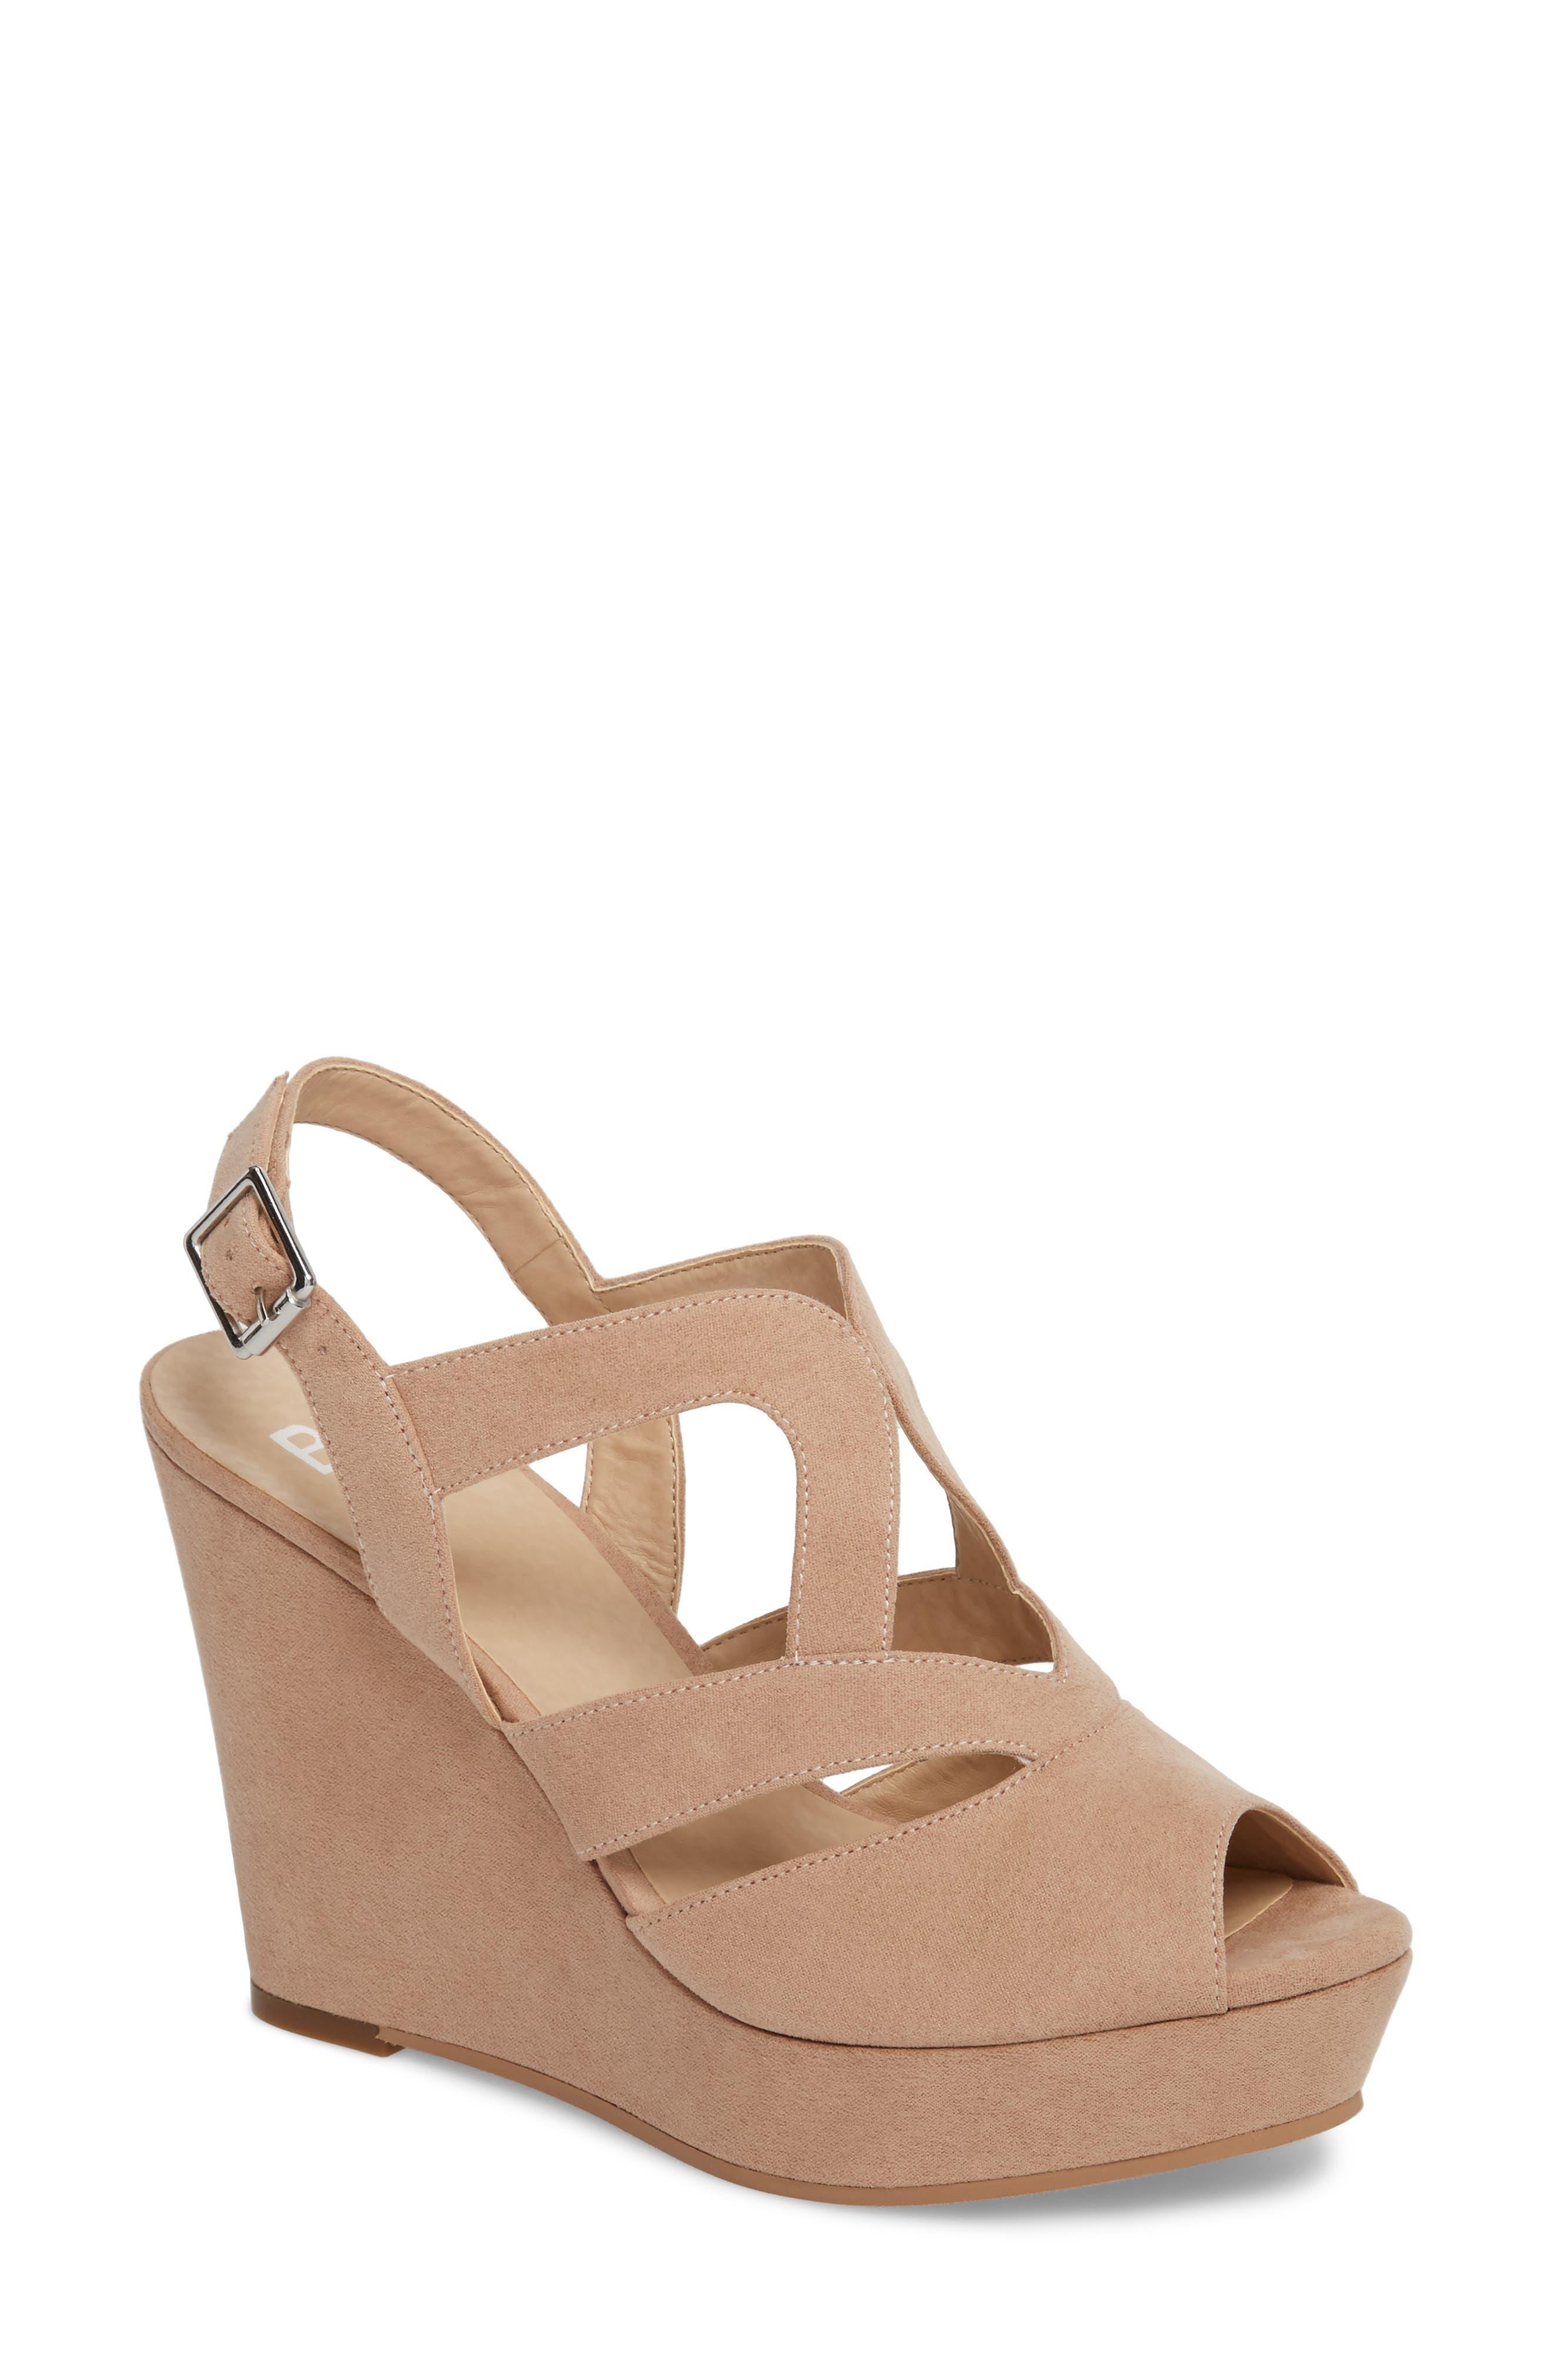 Sunny Platform Wedge Sandal,                             Main thumbnail 1, color,                             Nude Faux Suede